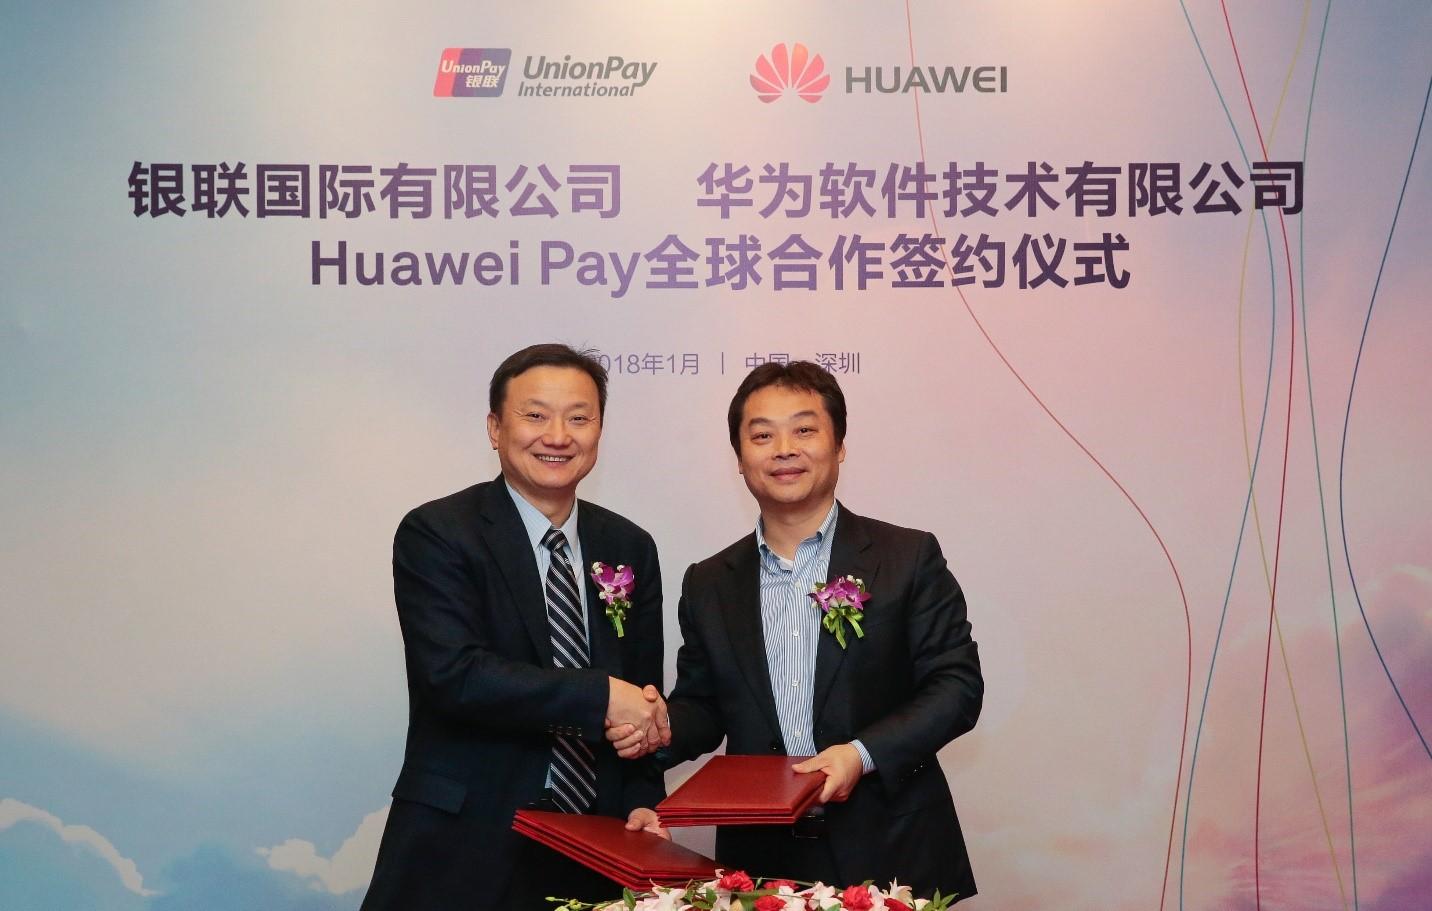 huawei pay unionpay